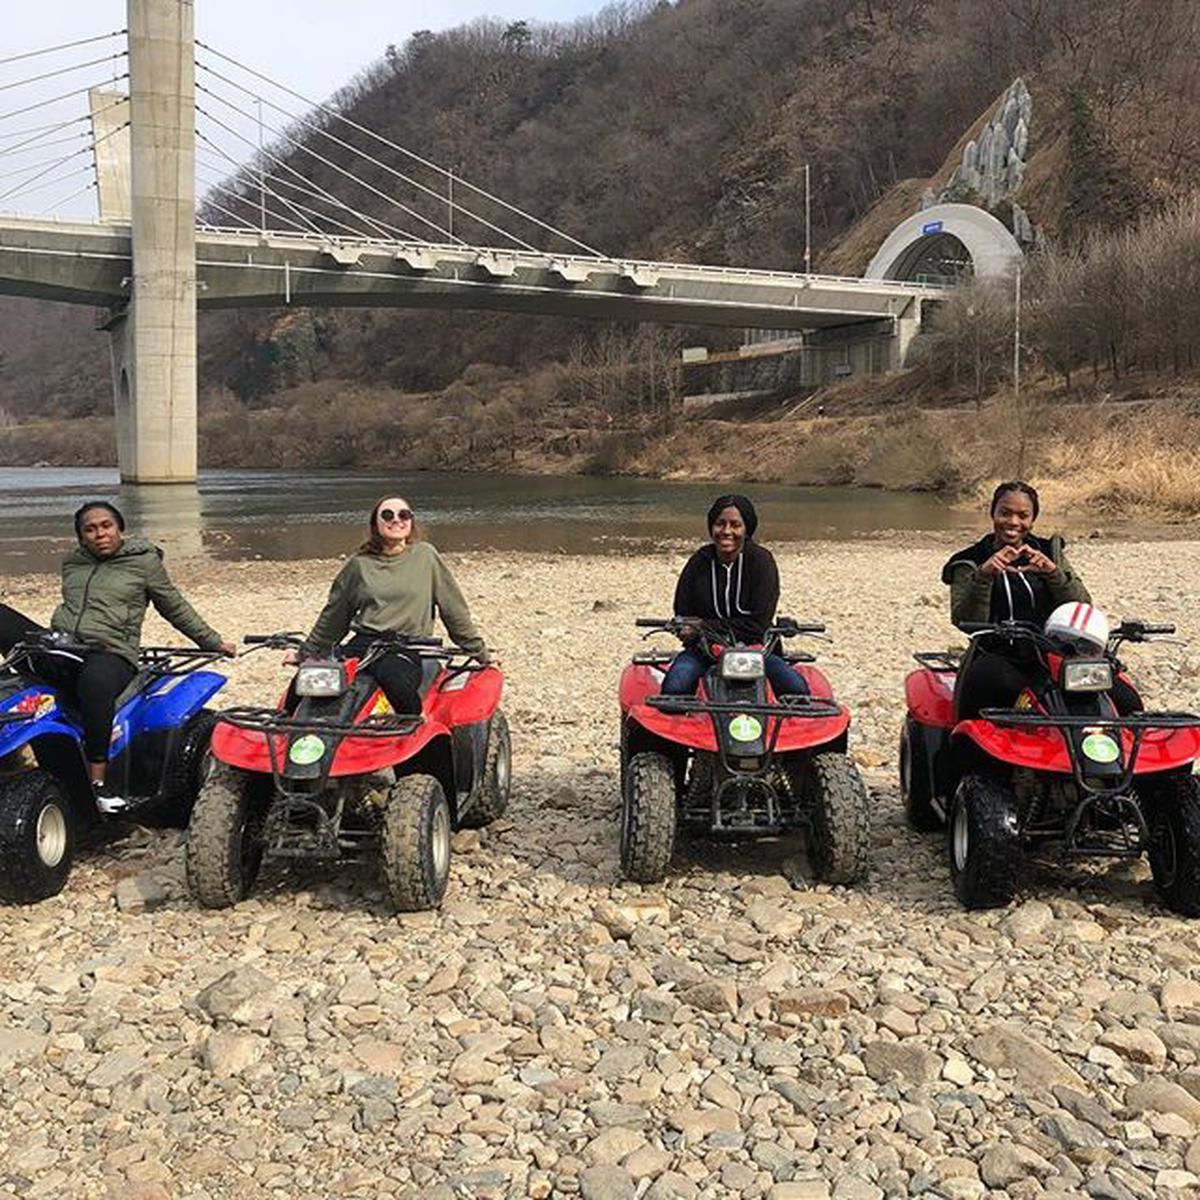 Gapyeong Zipline, Railbike, and ATV Day Trip from Seoul